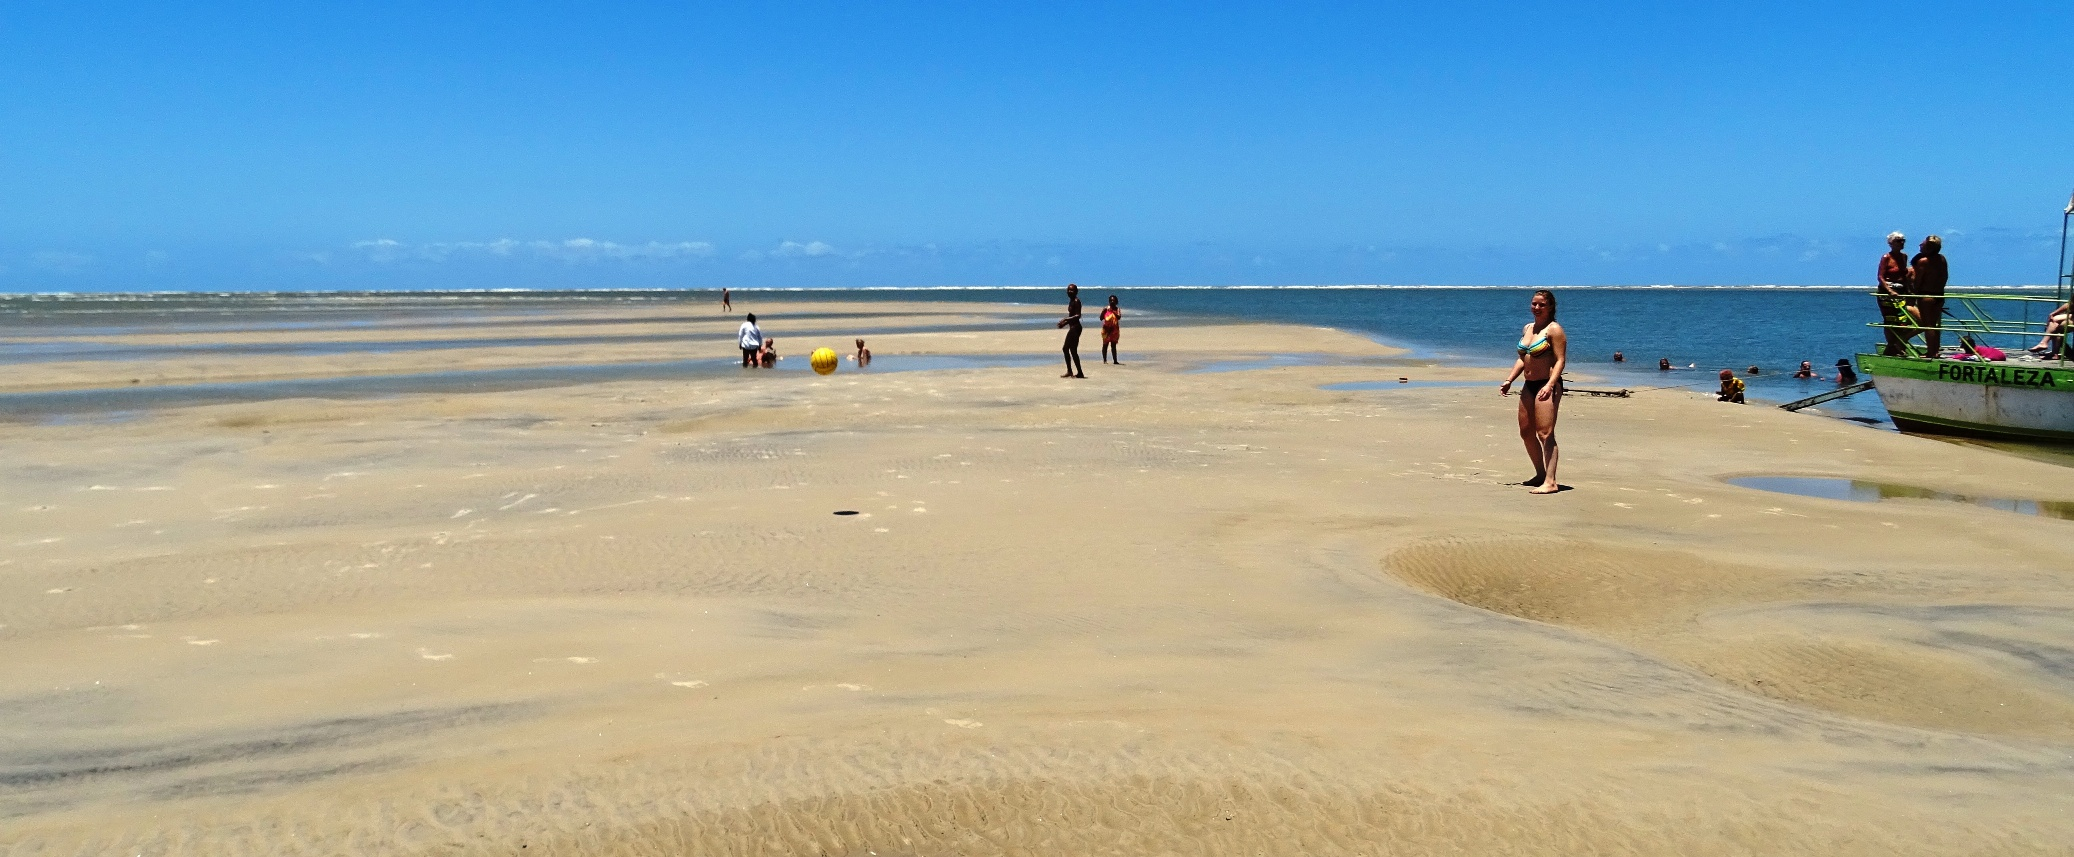 Insel Atalaia, Bahia,Brasil